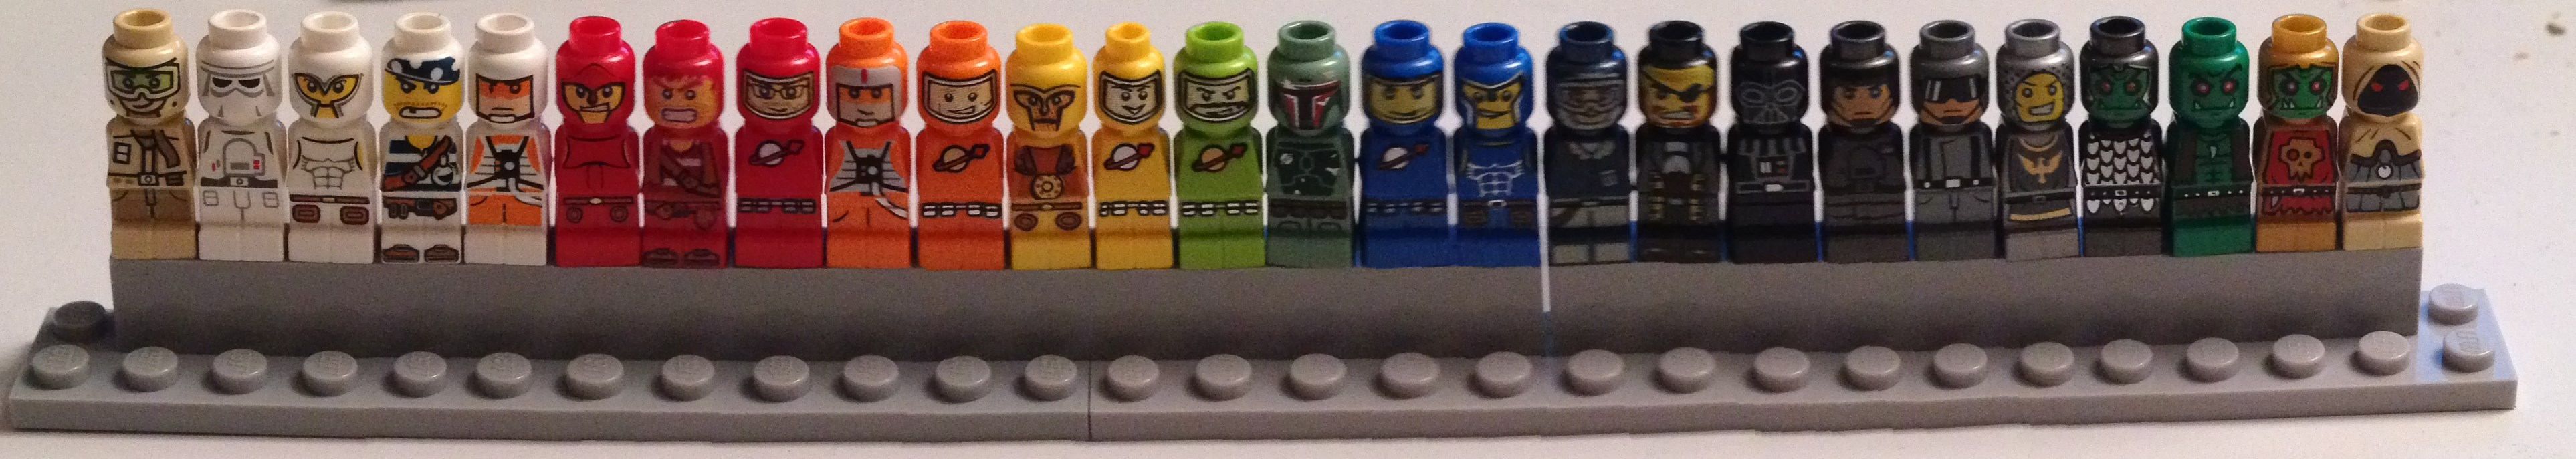 Lego Microfigs für Inquisitor